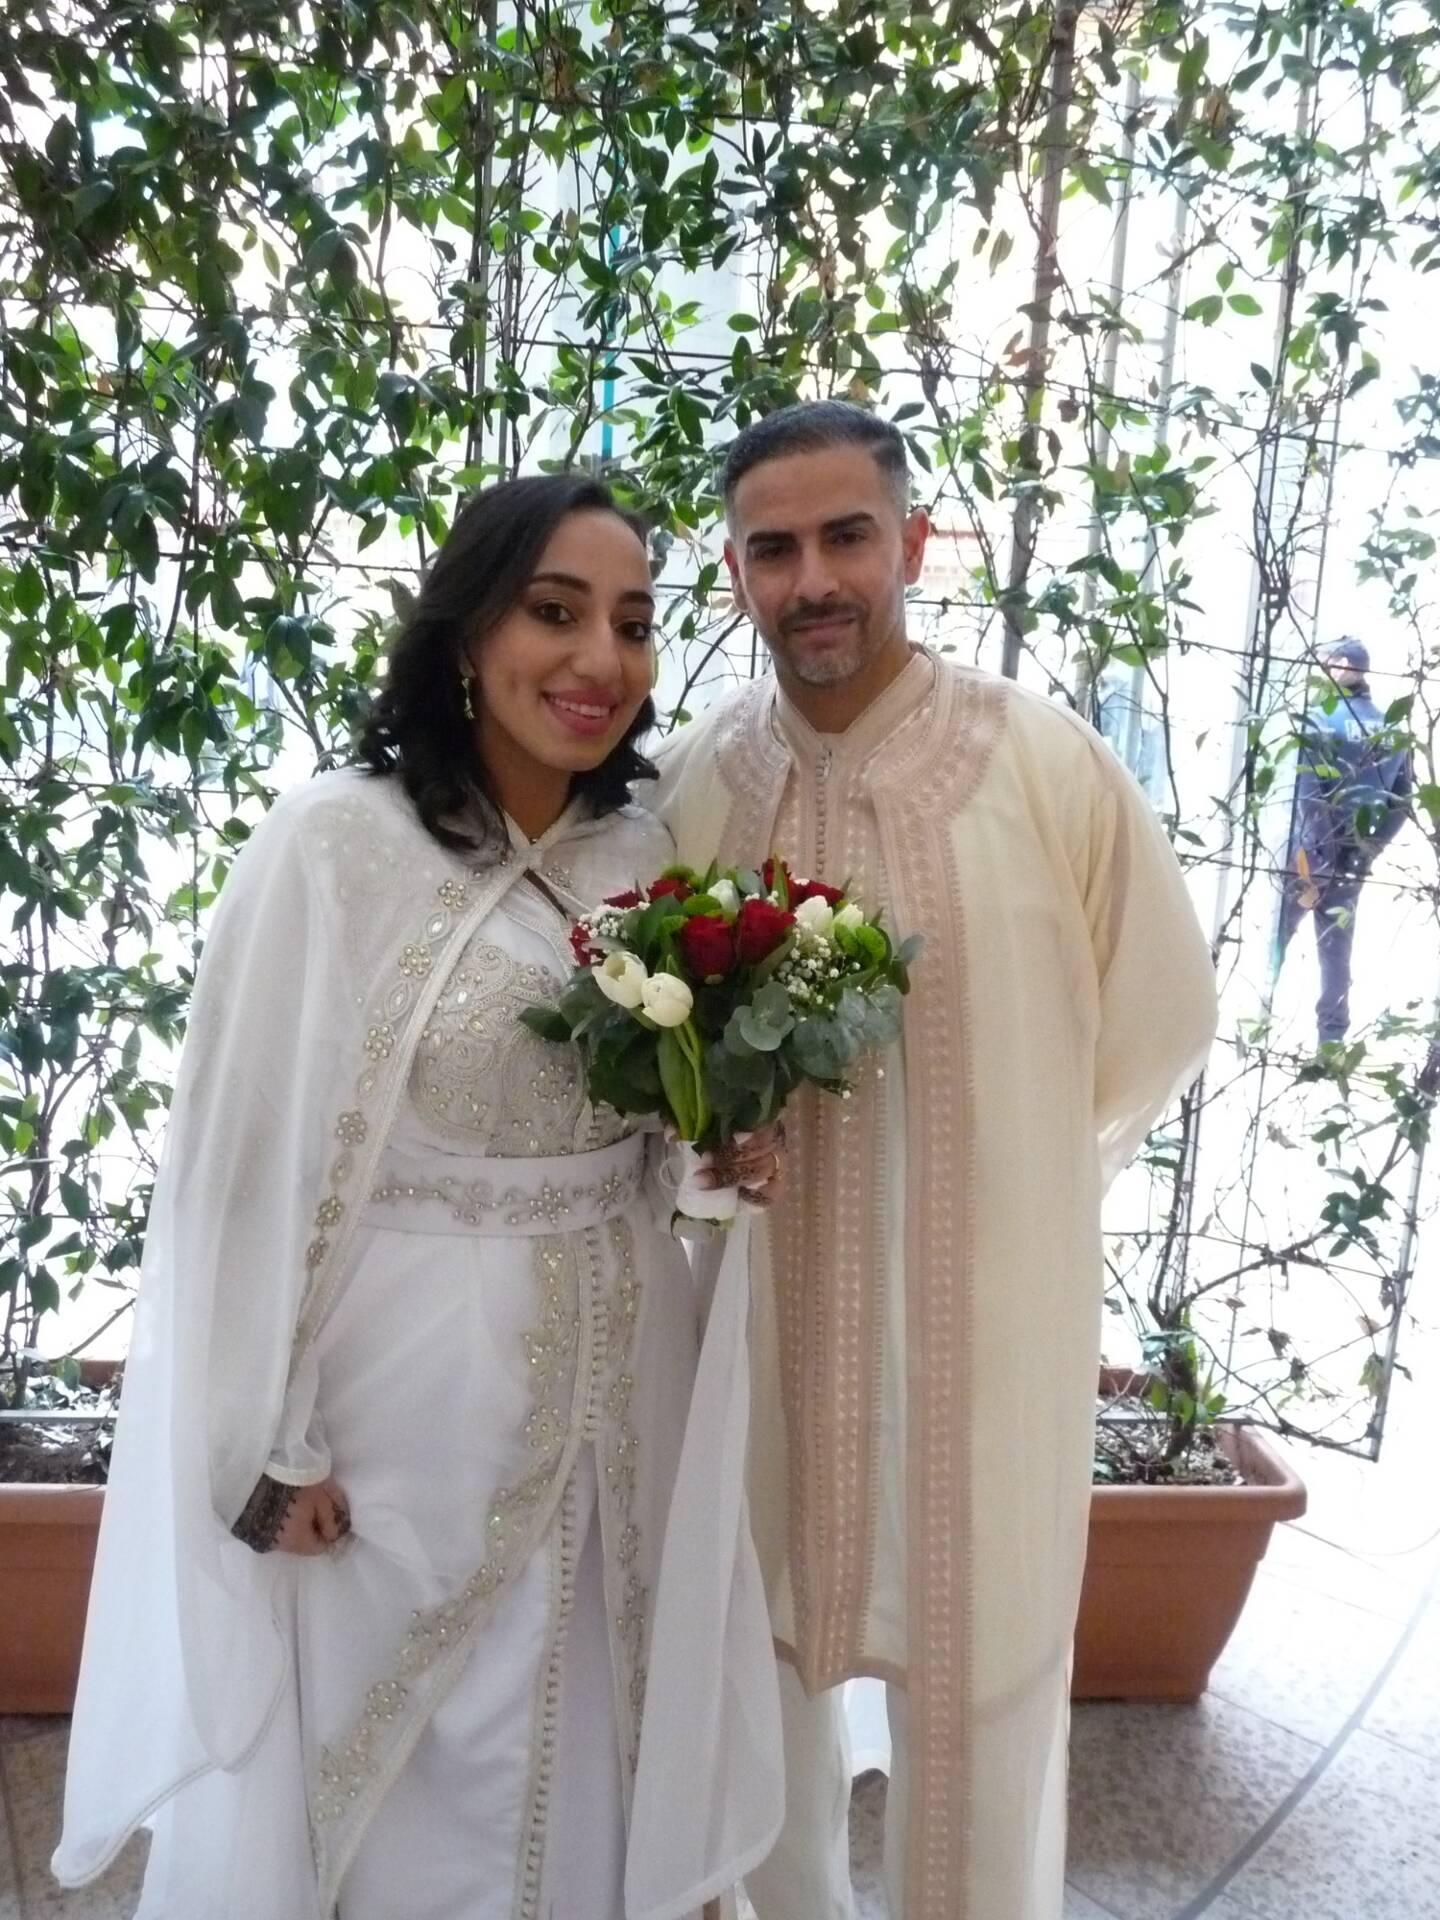 Imane Charfeddin,aide-soignante et Imad Ragoubi, agent de sûreté.